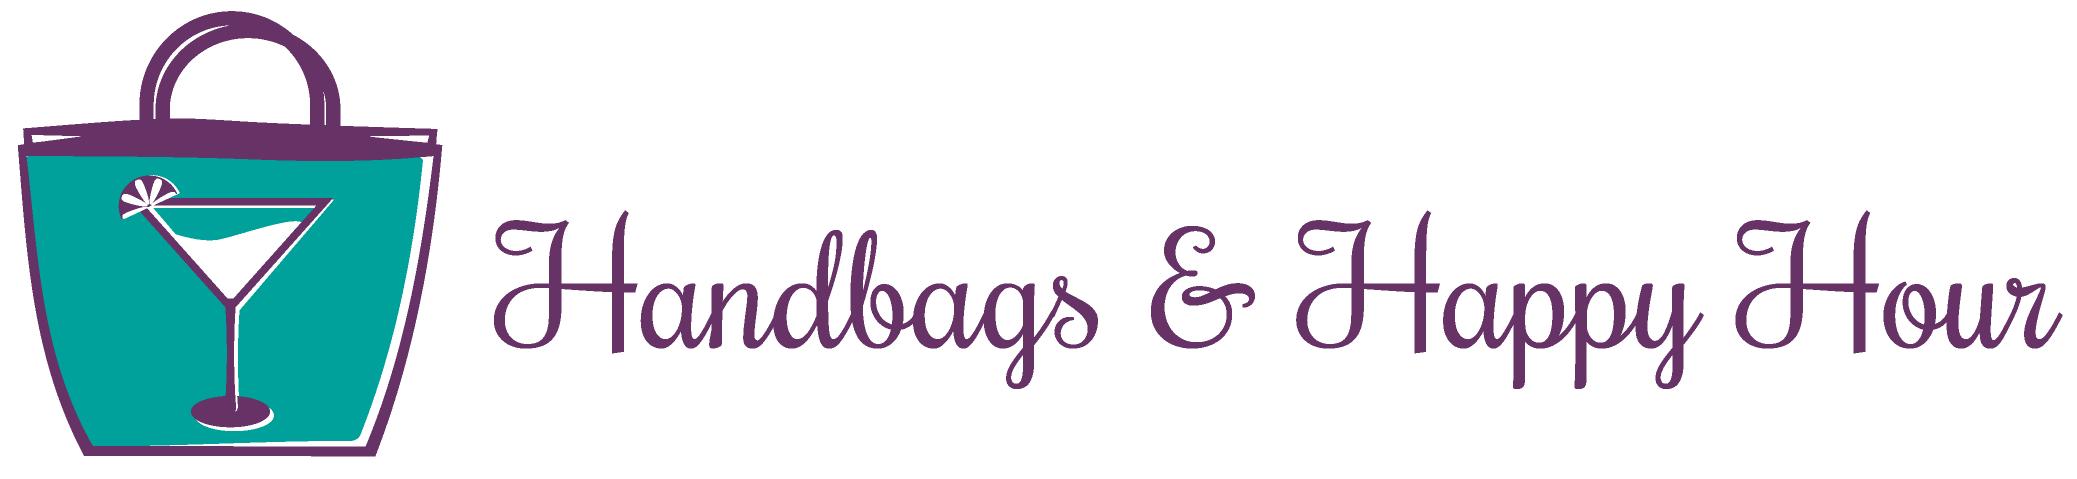 Handbags & Happy Hour 2019